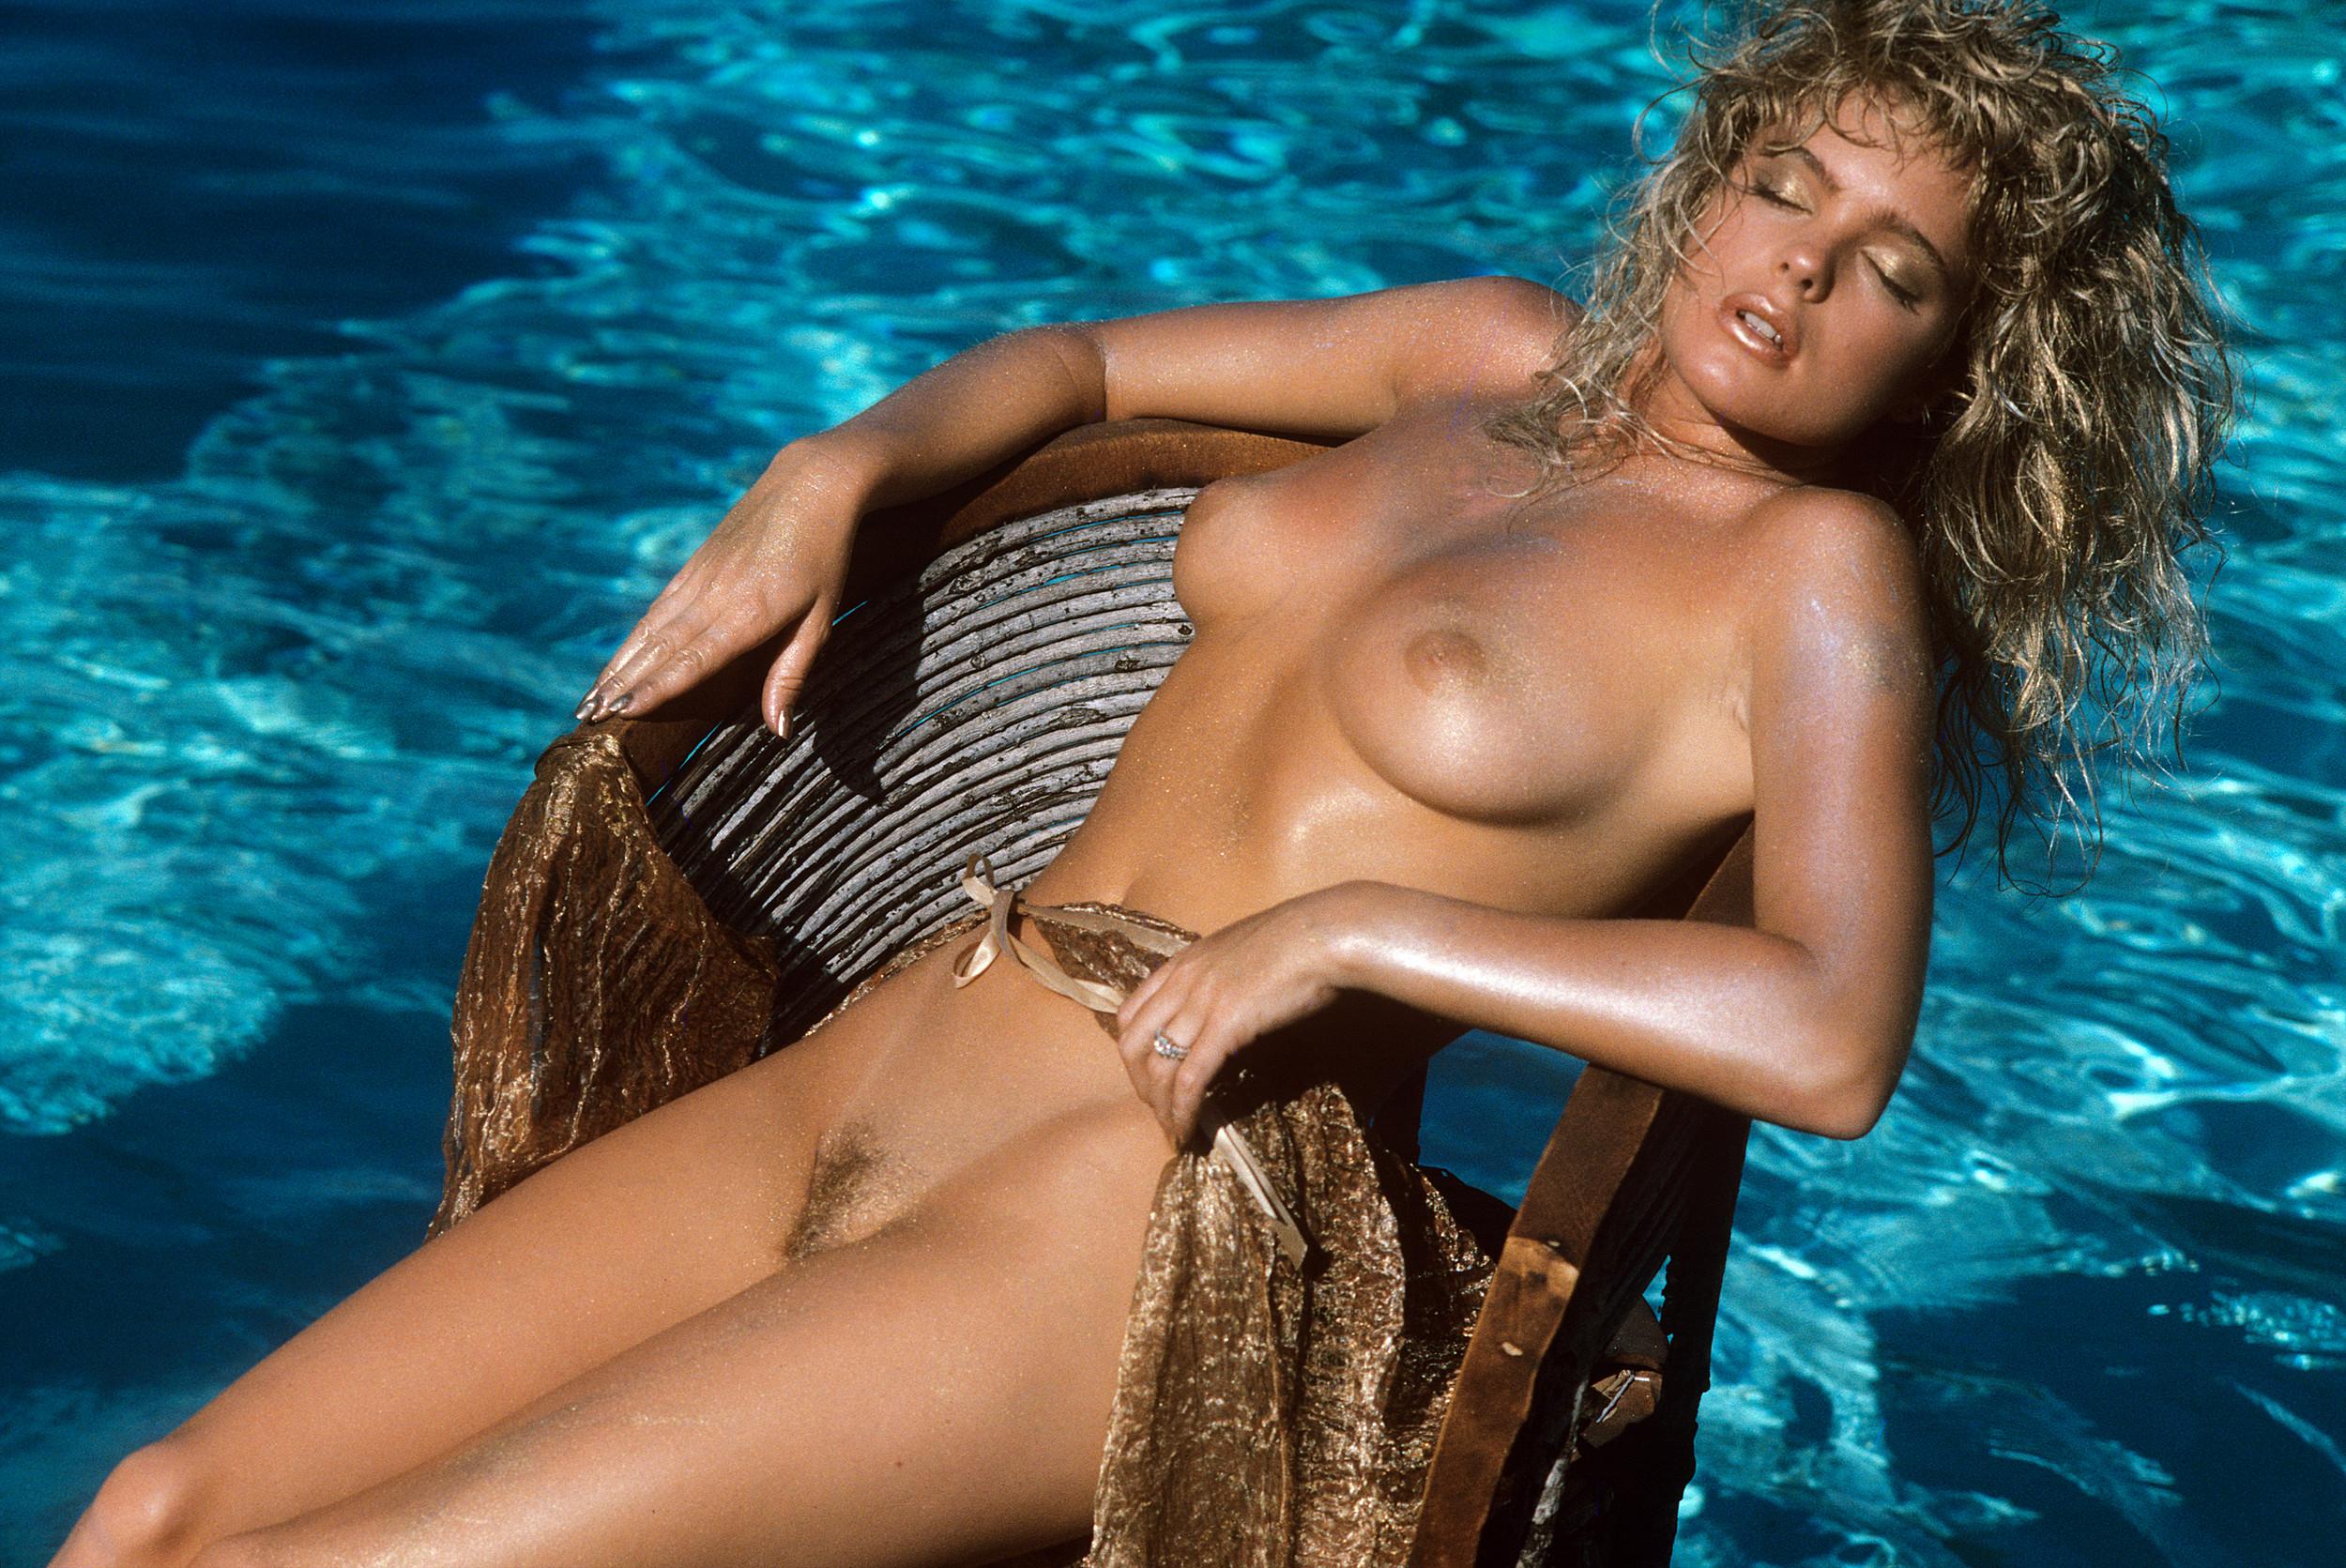 Erika Eleniak Nude Immagini Valutazione 87610-3131